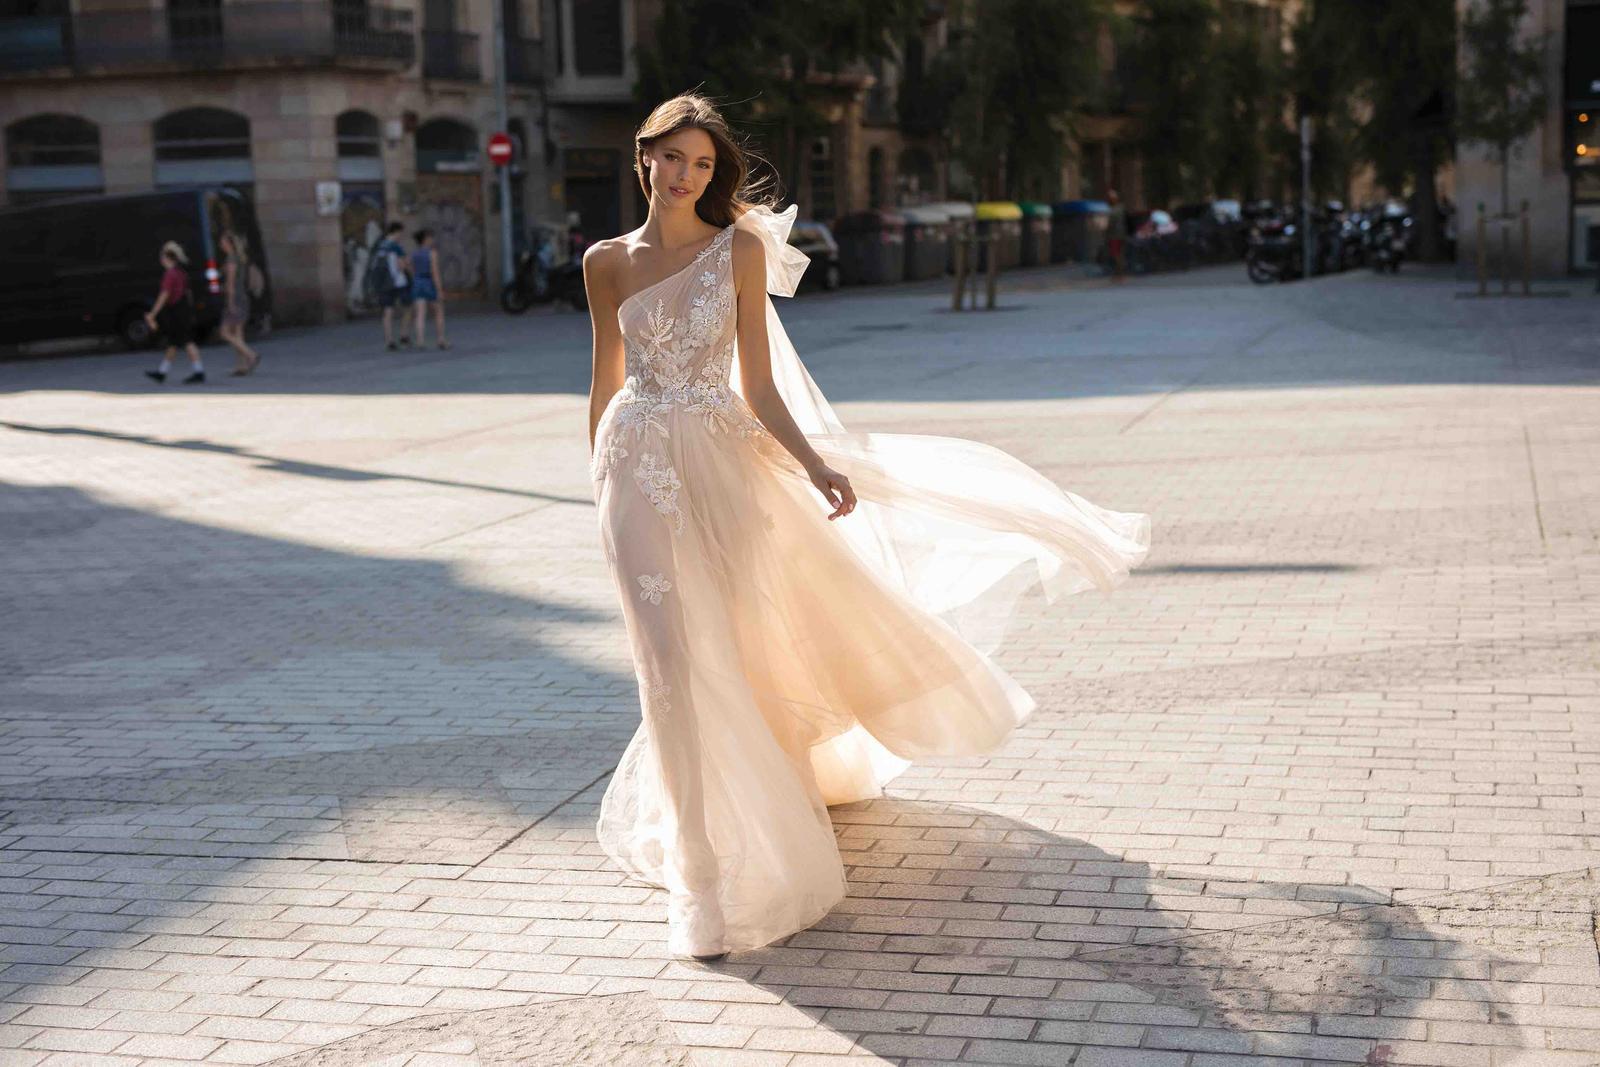 Muse by Berta * Svadobné šaty z kolekcií na rok 2019 - Obrázok č. 1